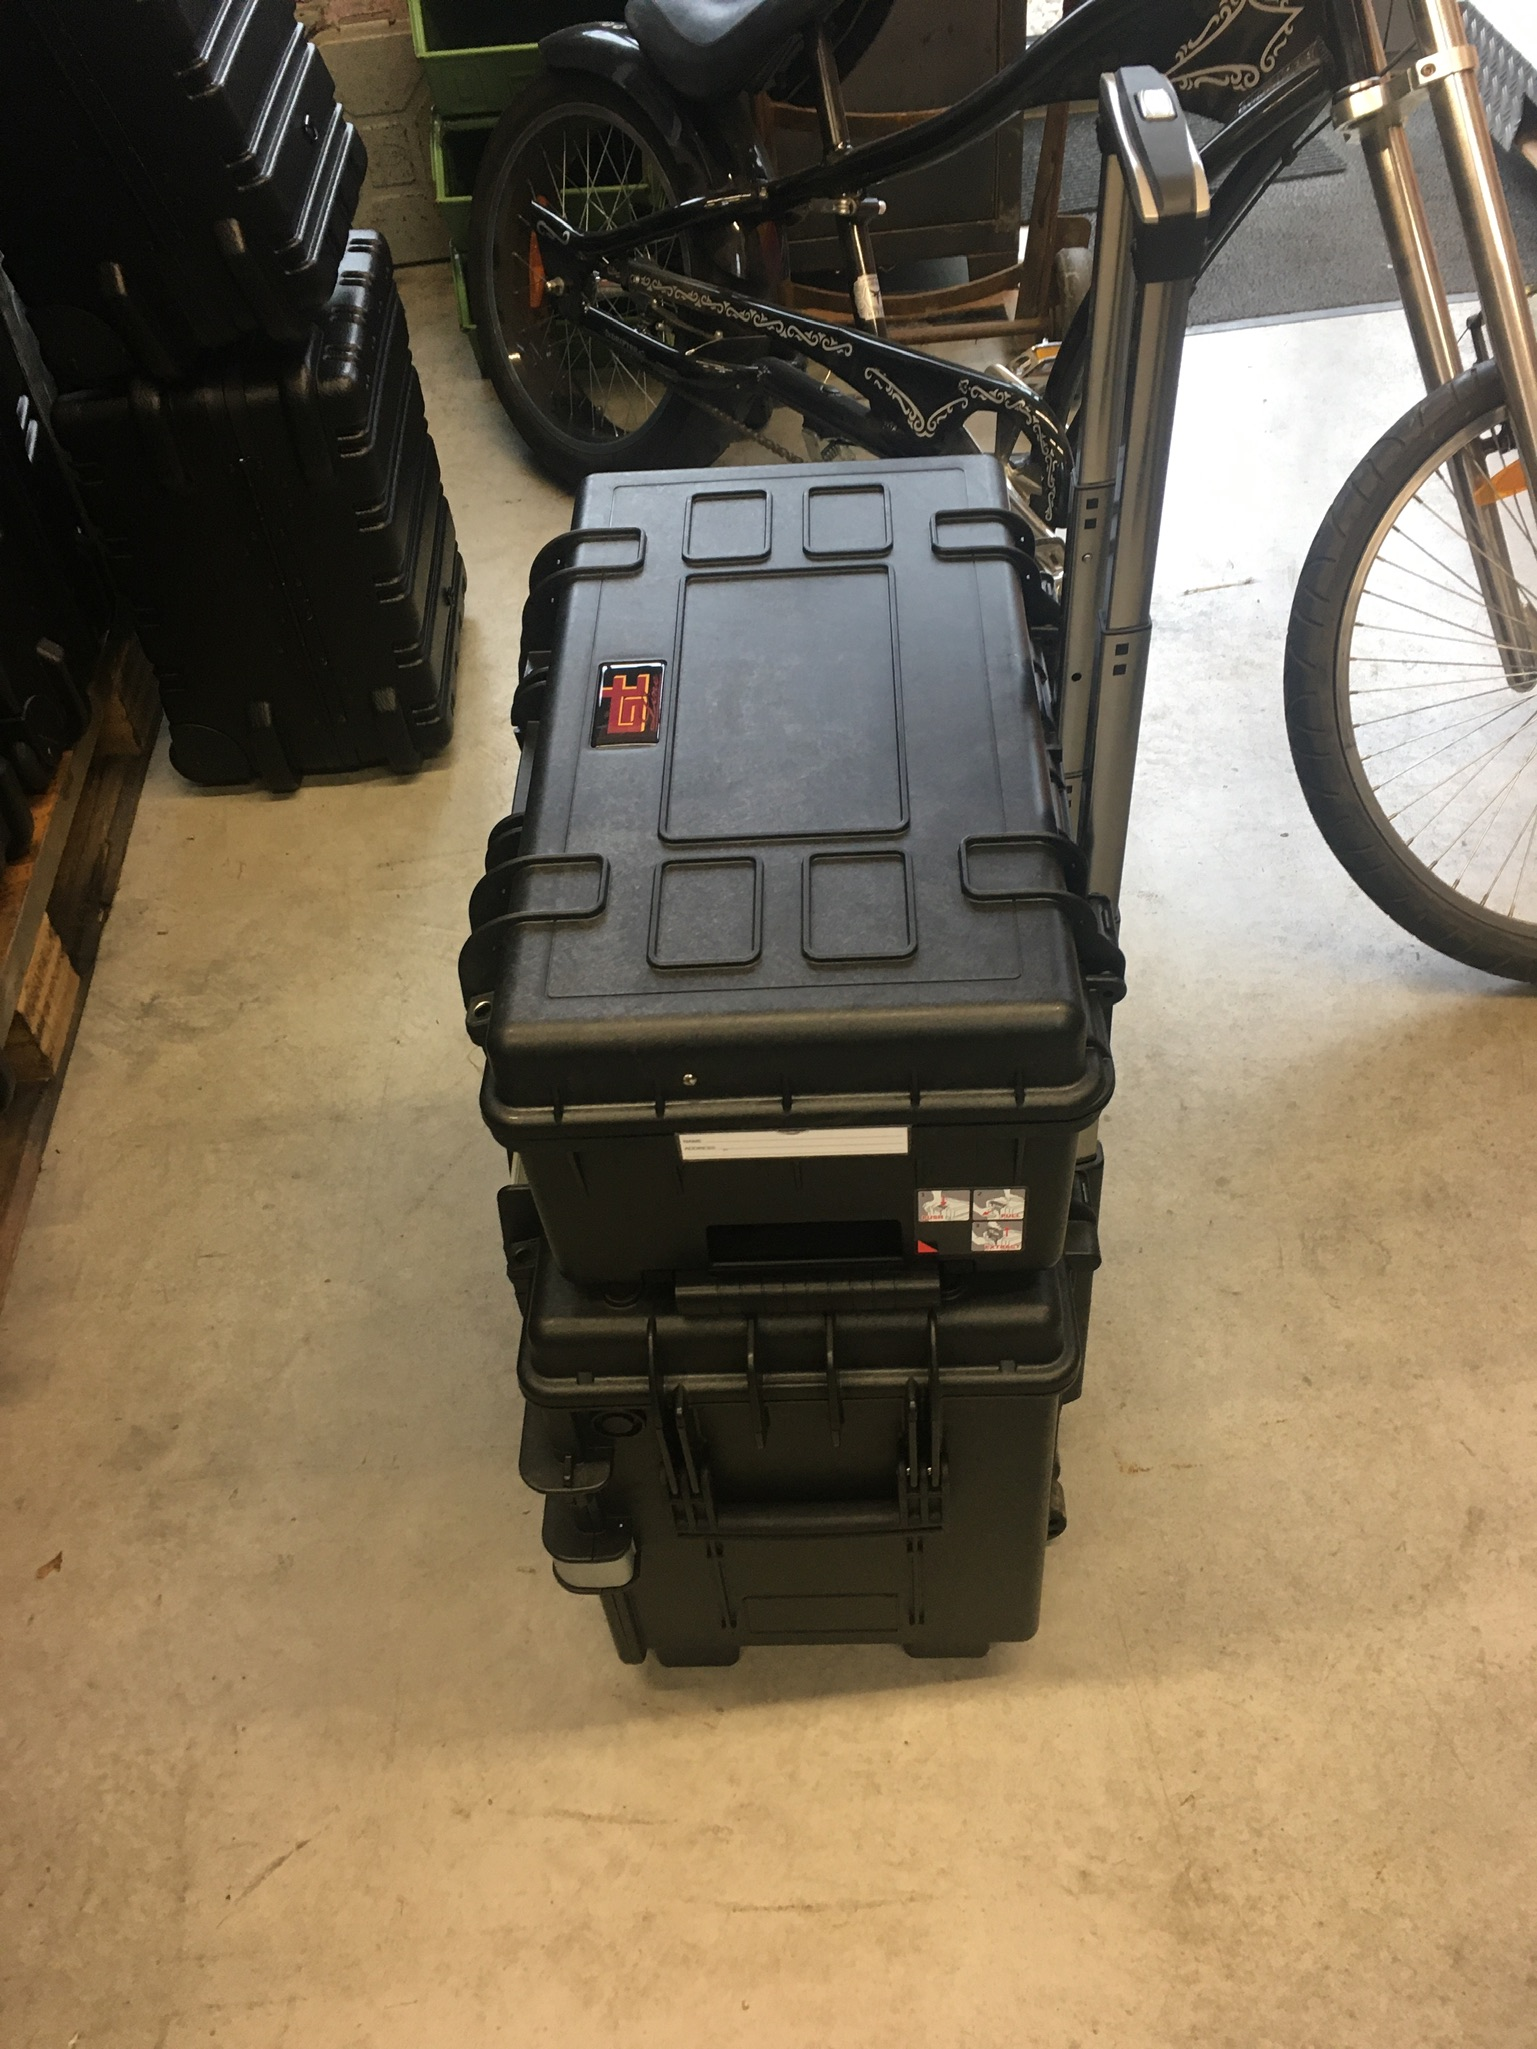 ALL-IN-ONE-und-Explorer-52-21-PTS-huckepack